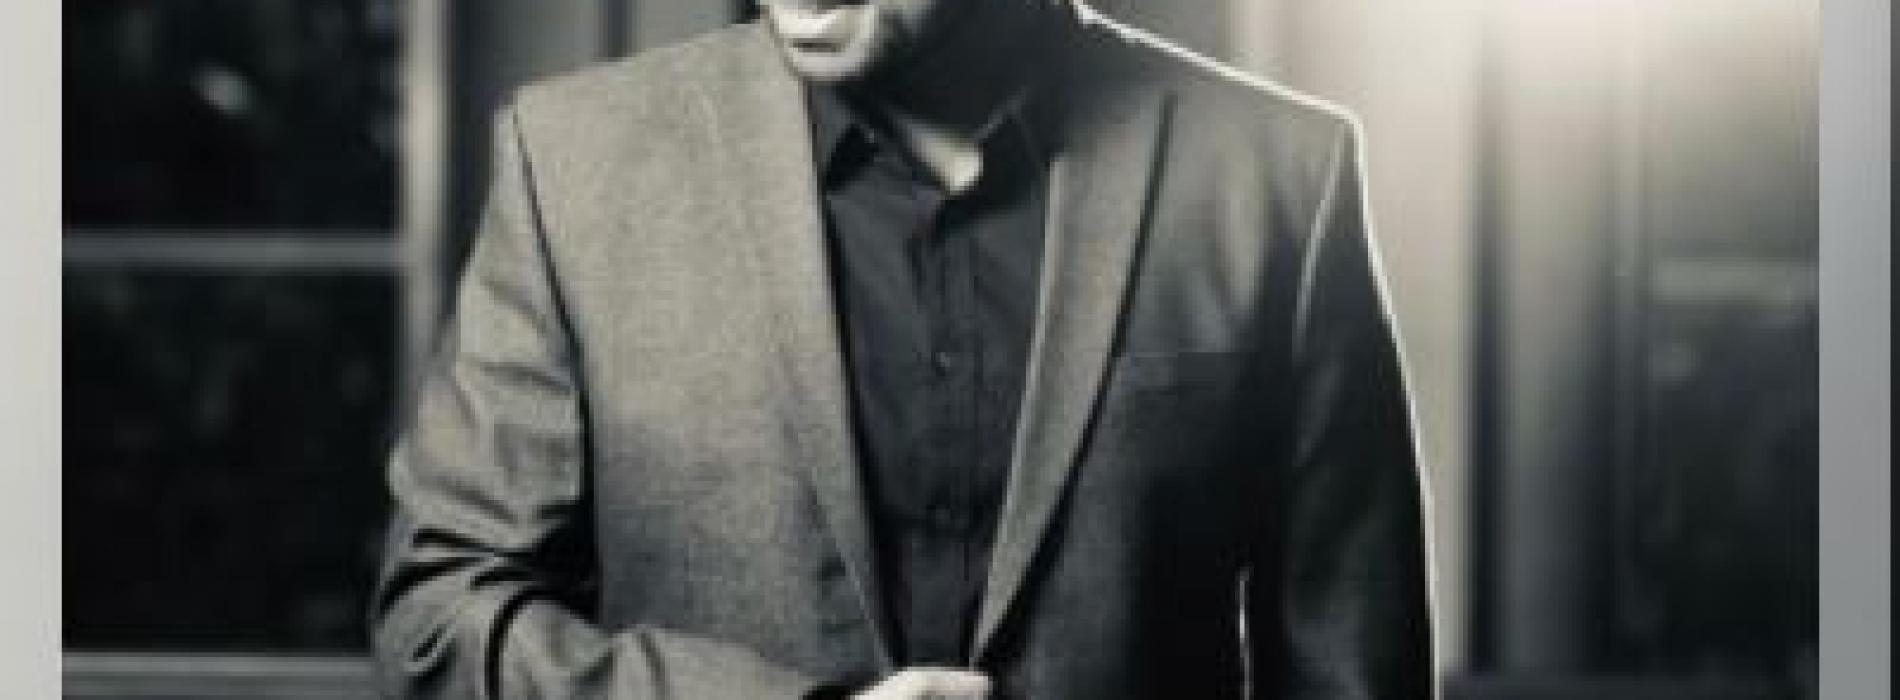 News : Jerome Silva Releases His Album 'Transformed'